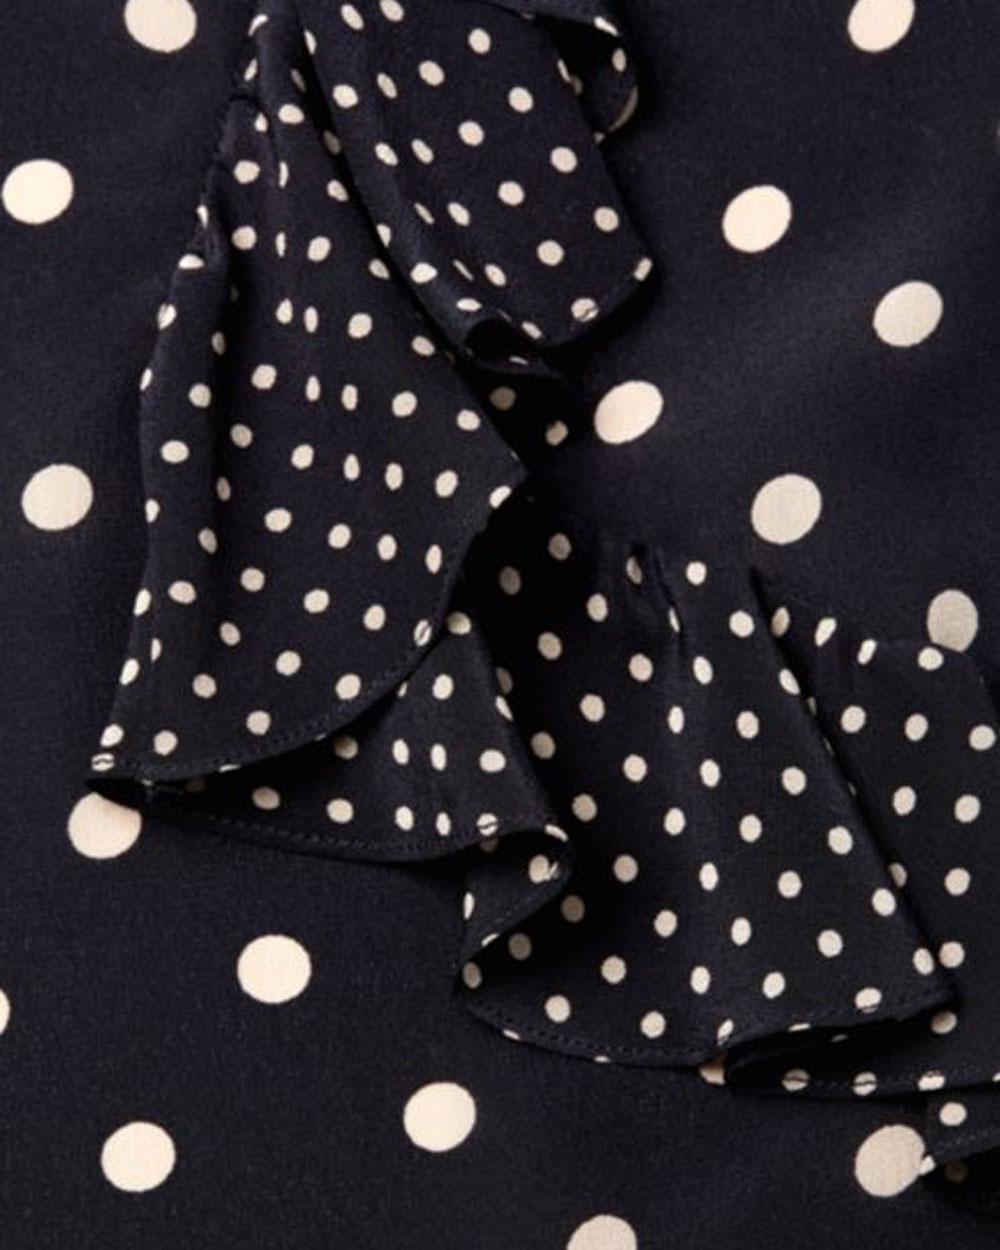 295dc824de00 Lyst - Rebecca Taylor Navy Long Sleeve Polka Dot Ruffle Top in Blue